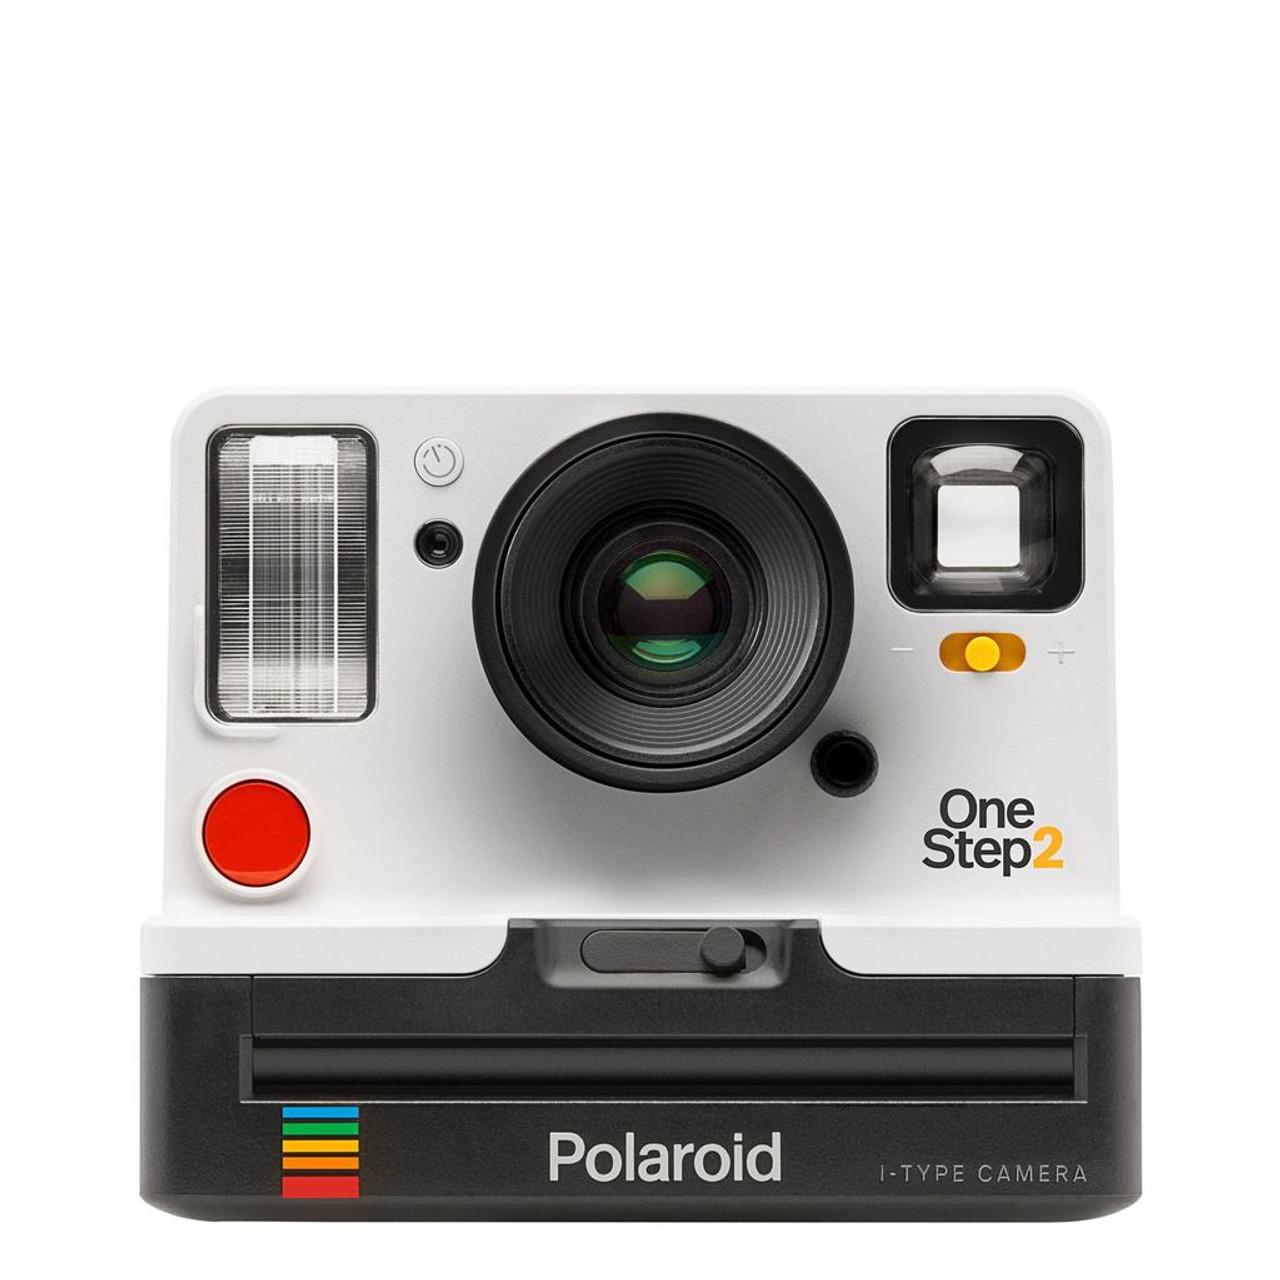 Polaroid Onestep 2 I Type Camera Different Types Of Digital Cameras White